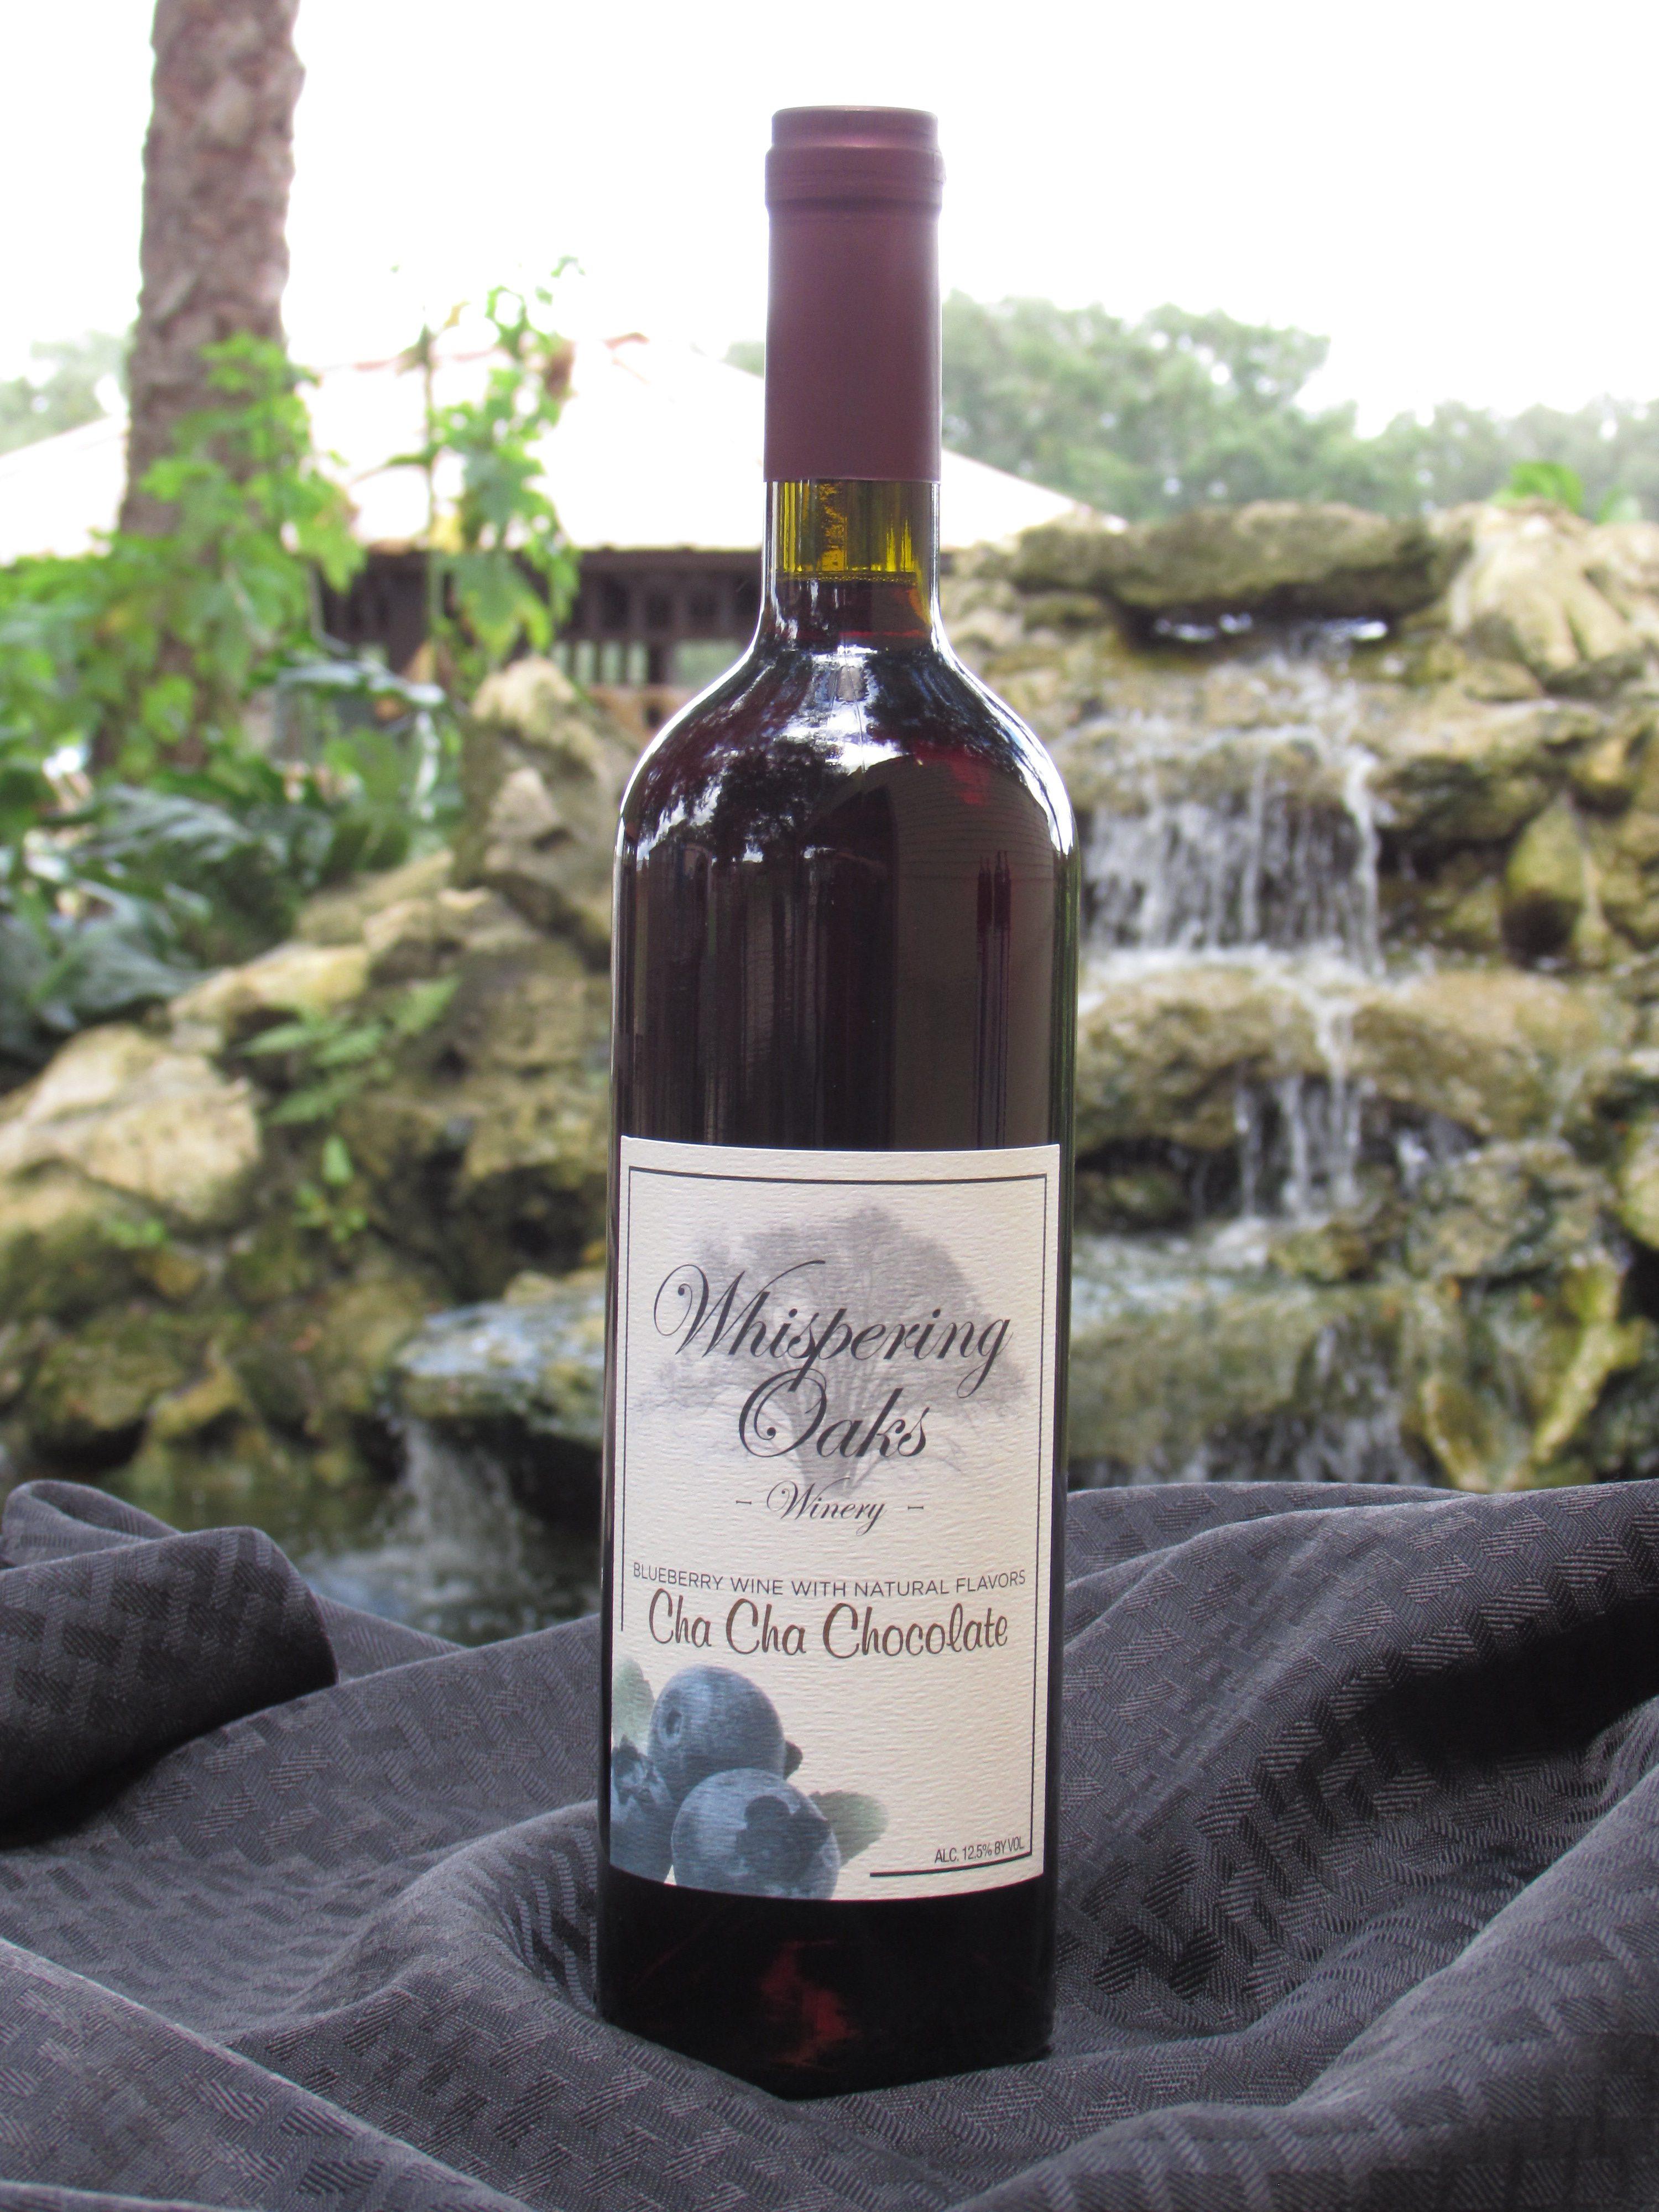 Whispering Oaks Winery >> Whispering Oaks Winery